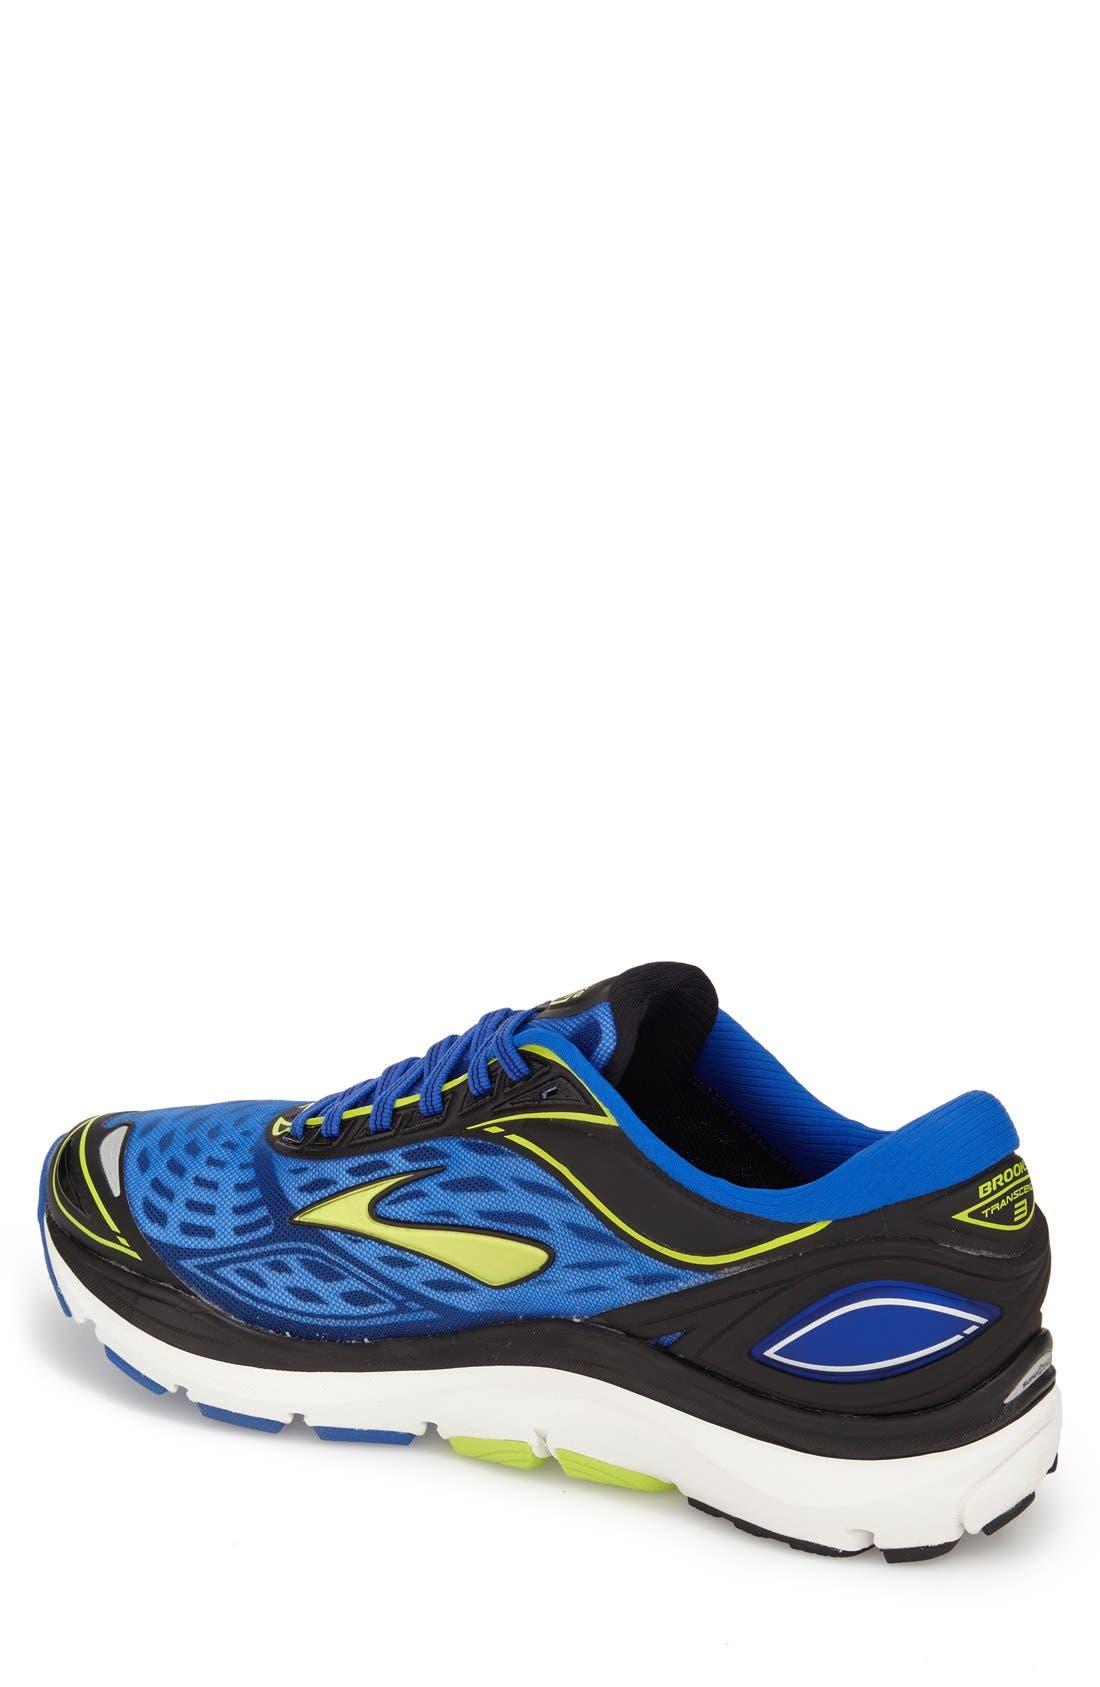 'Transcend 3' Running Shoe,                             Alternate thumbnail 2, color,                             Electric Blue/ Lime/ Black